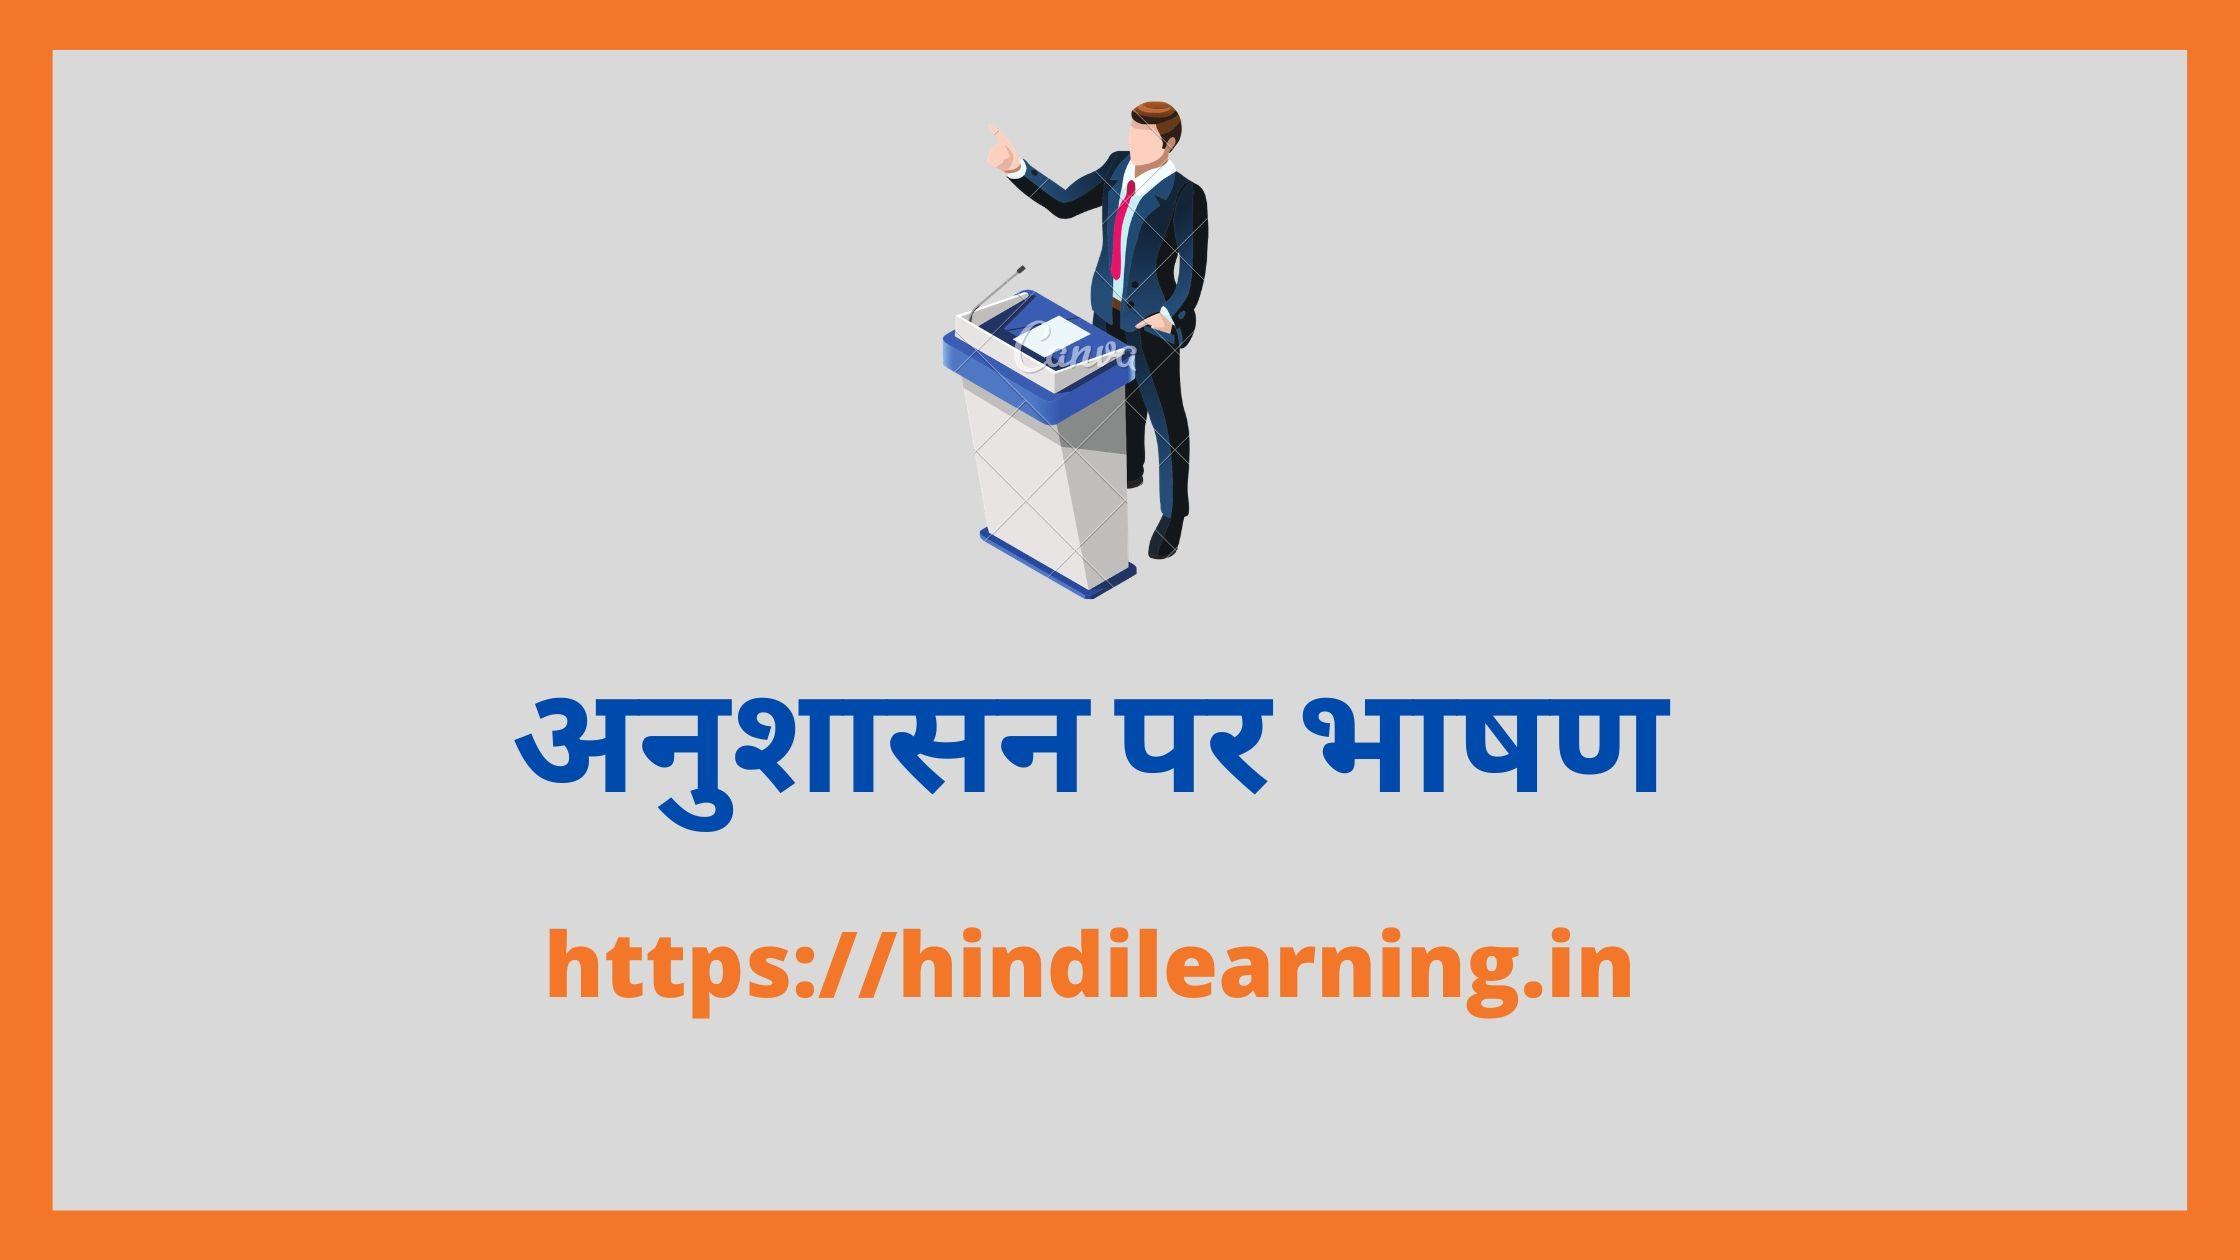 अनुशासन पर भाषण - Speech on Discipline in Hindi